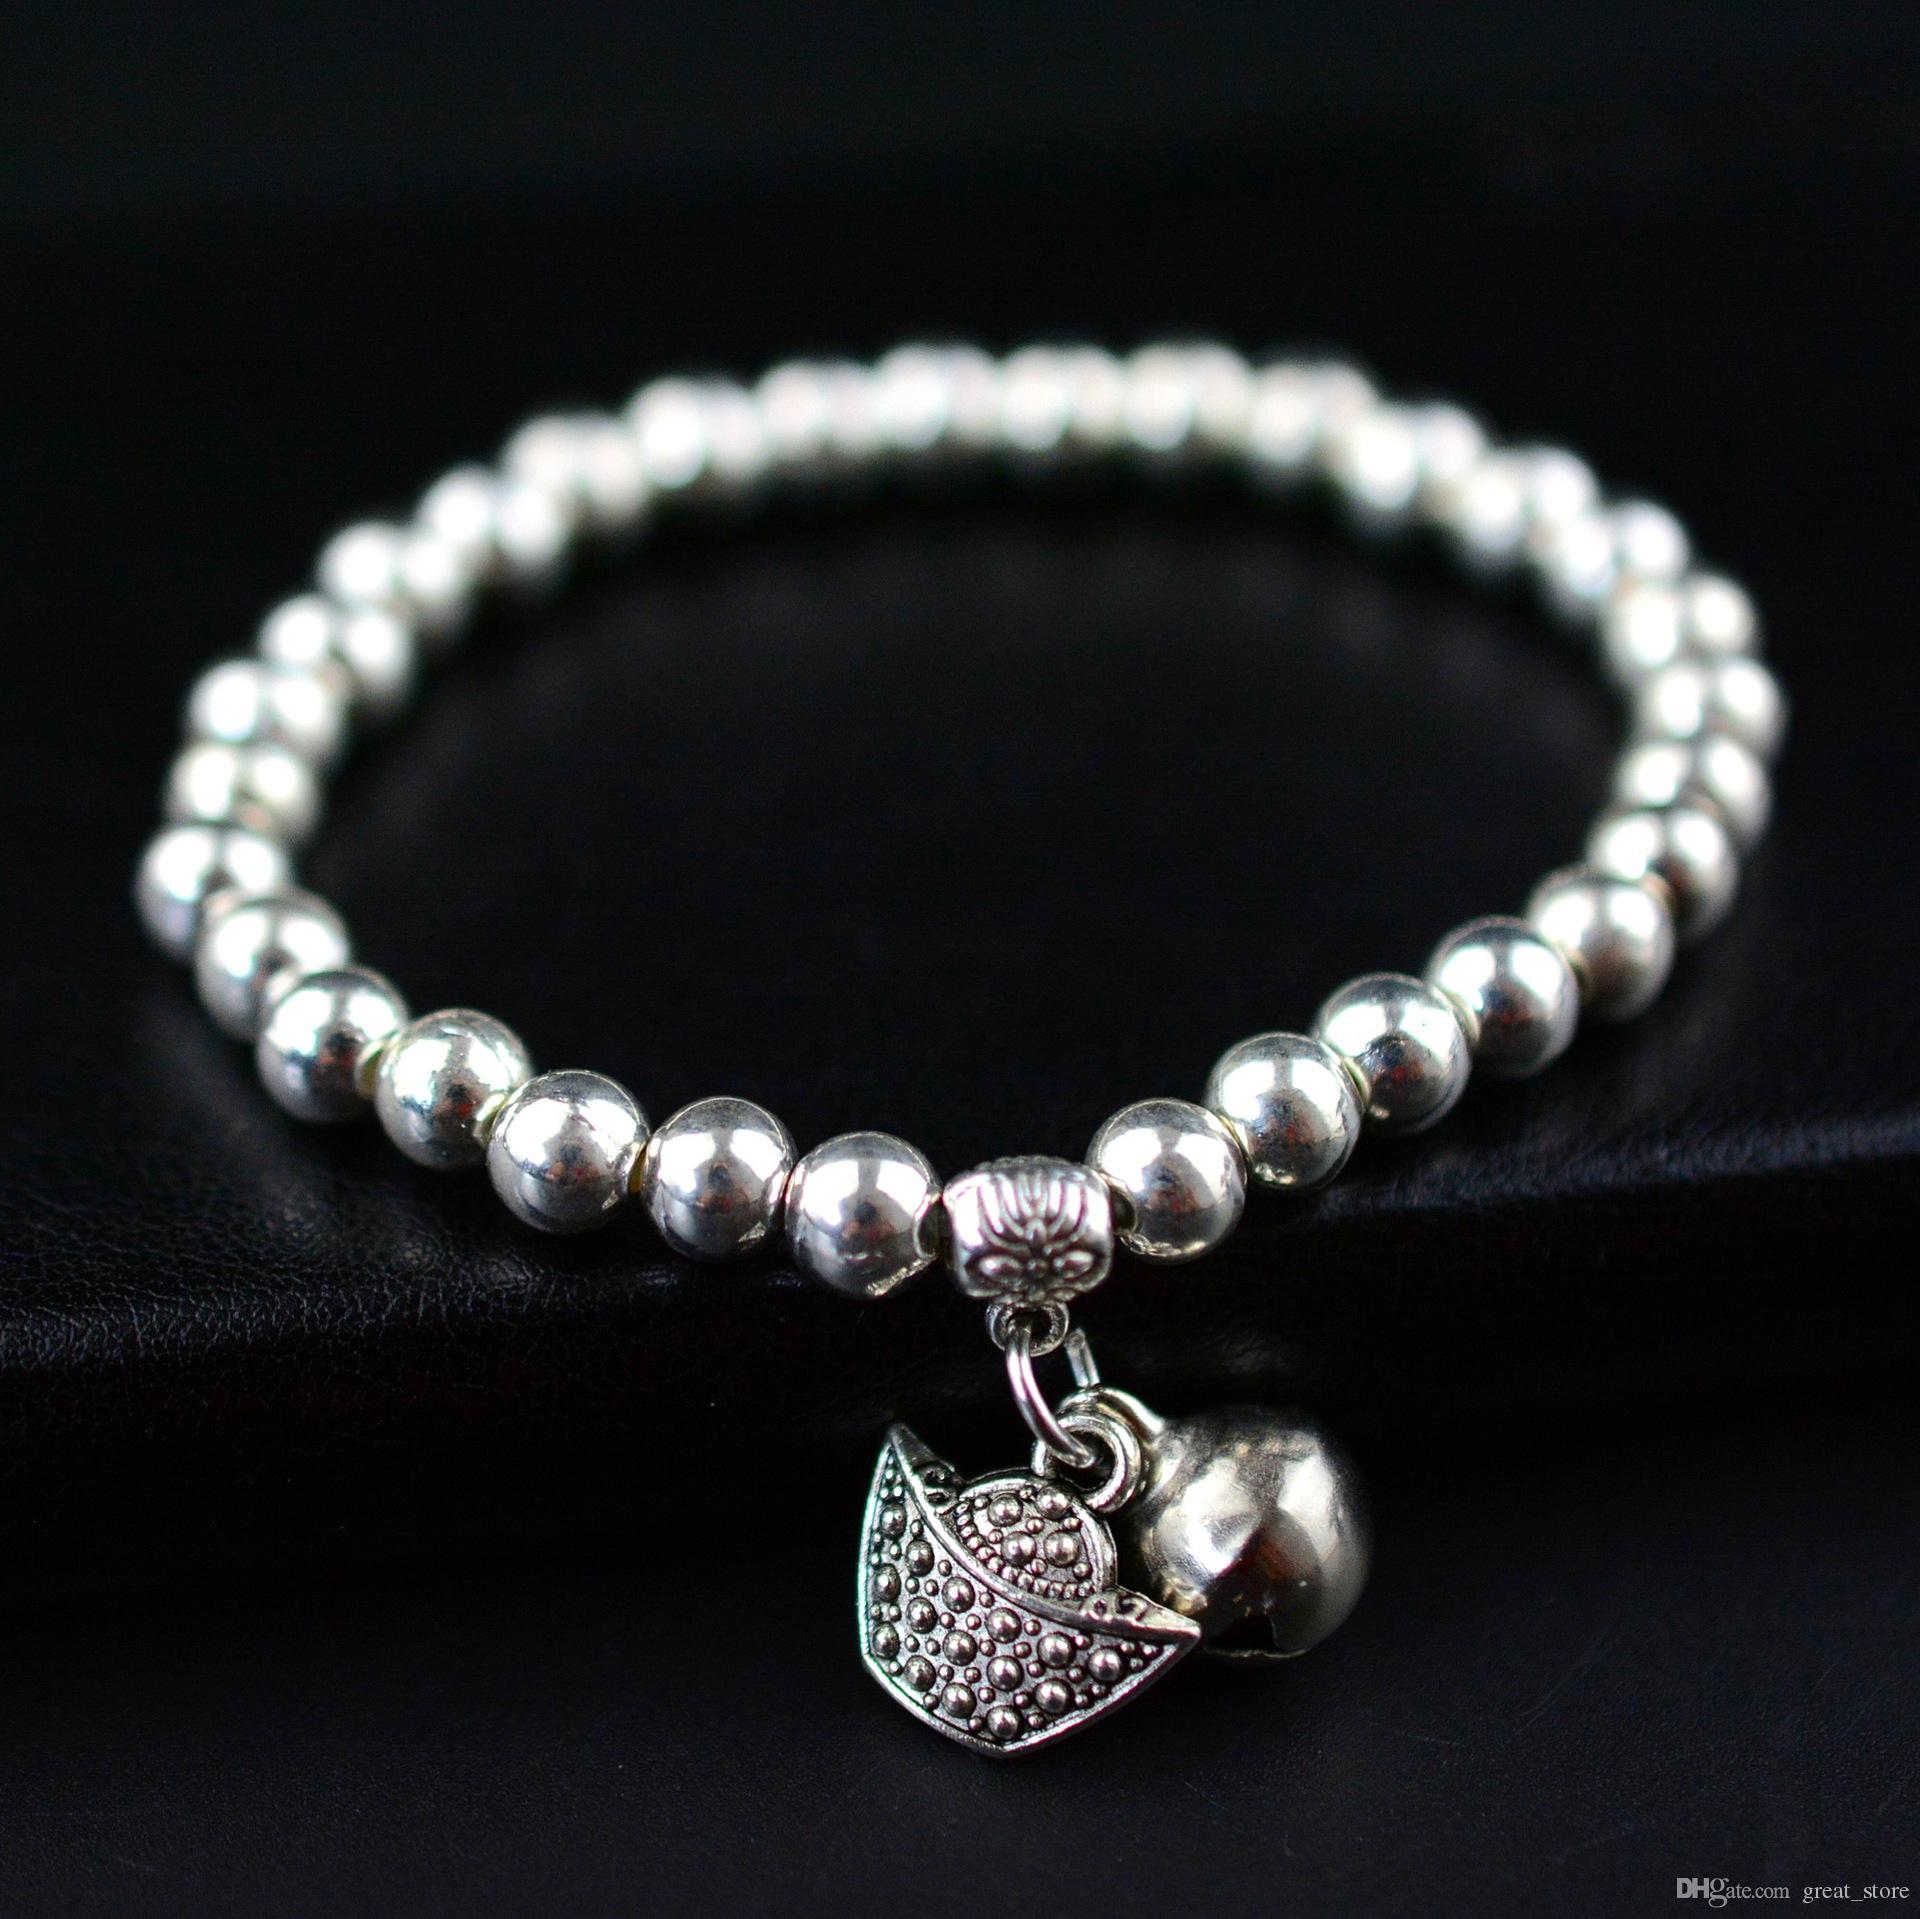 Kostenloser Versand Mode Verkauf Mode Miao Silber Armband Silber Silber Armband FB218 Mischungsauftrag 20 Stücke Viel Charme Armbänder